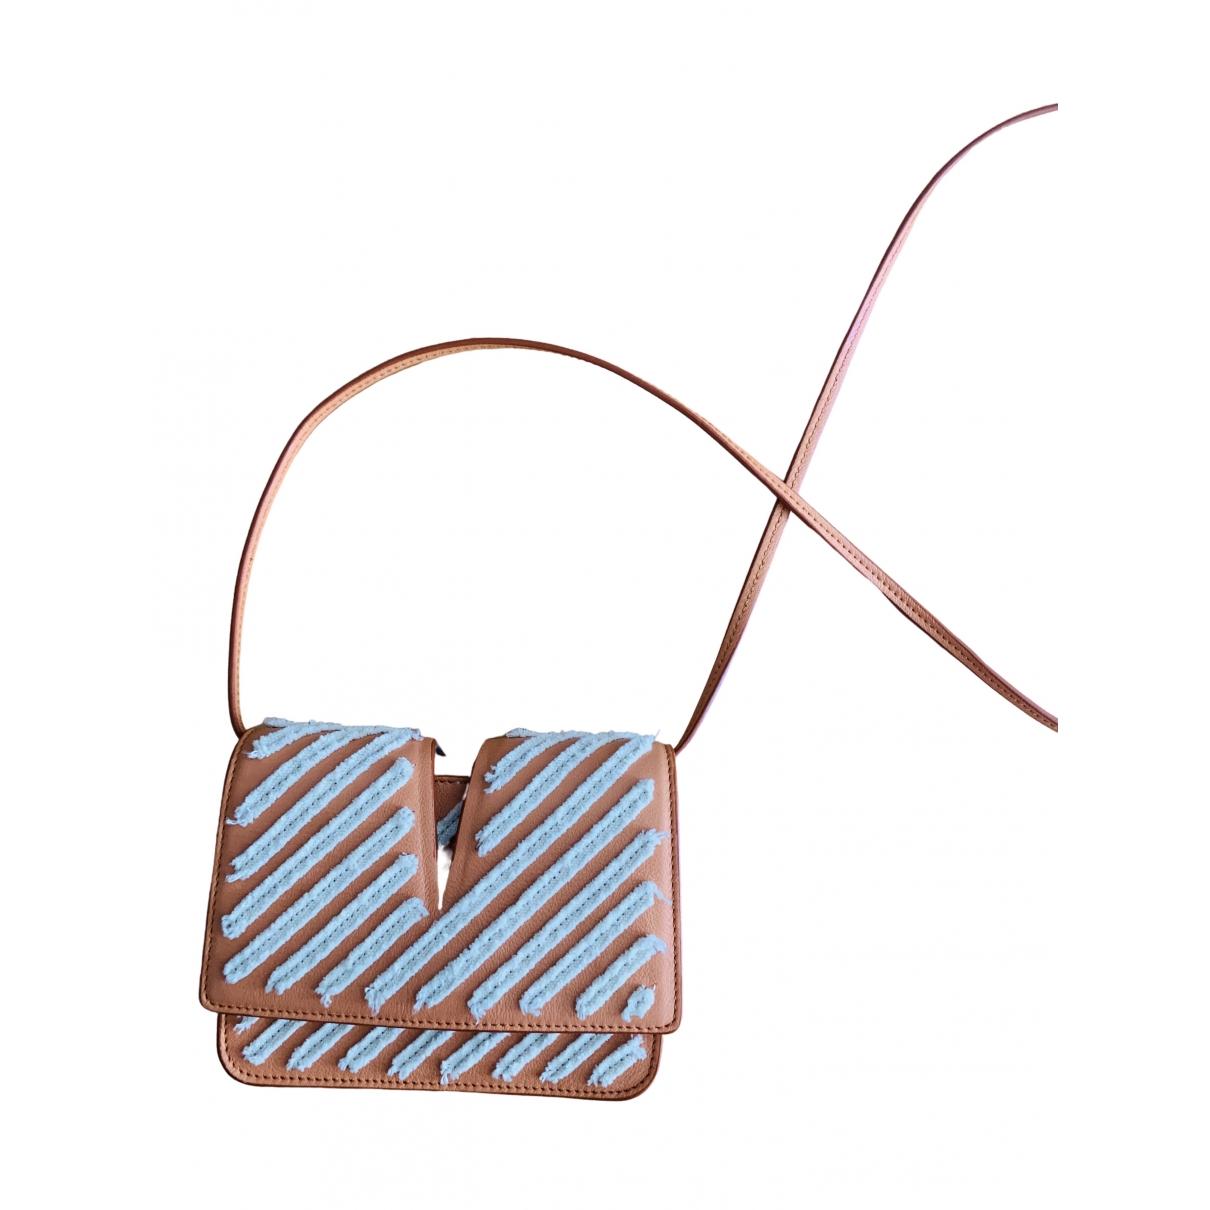 Jil Sander \N Orange Leather Clutch bag for Women \N